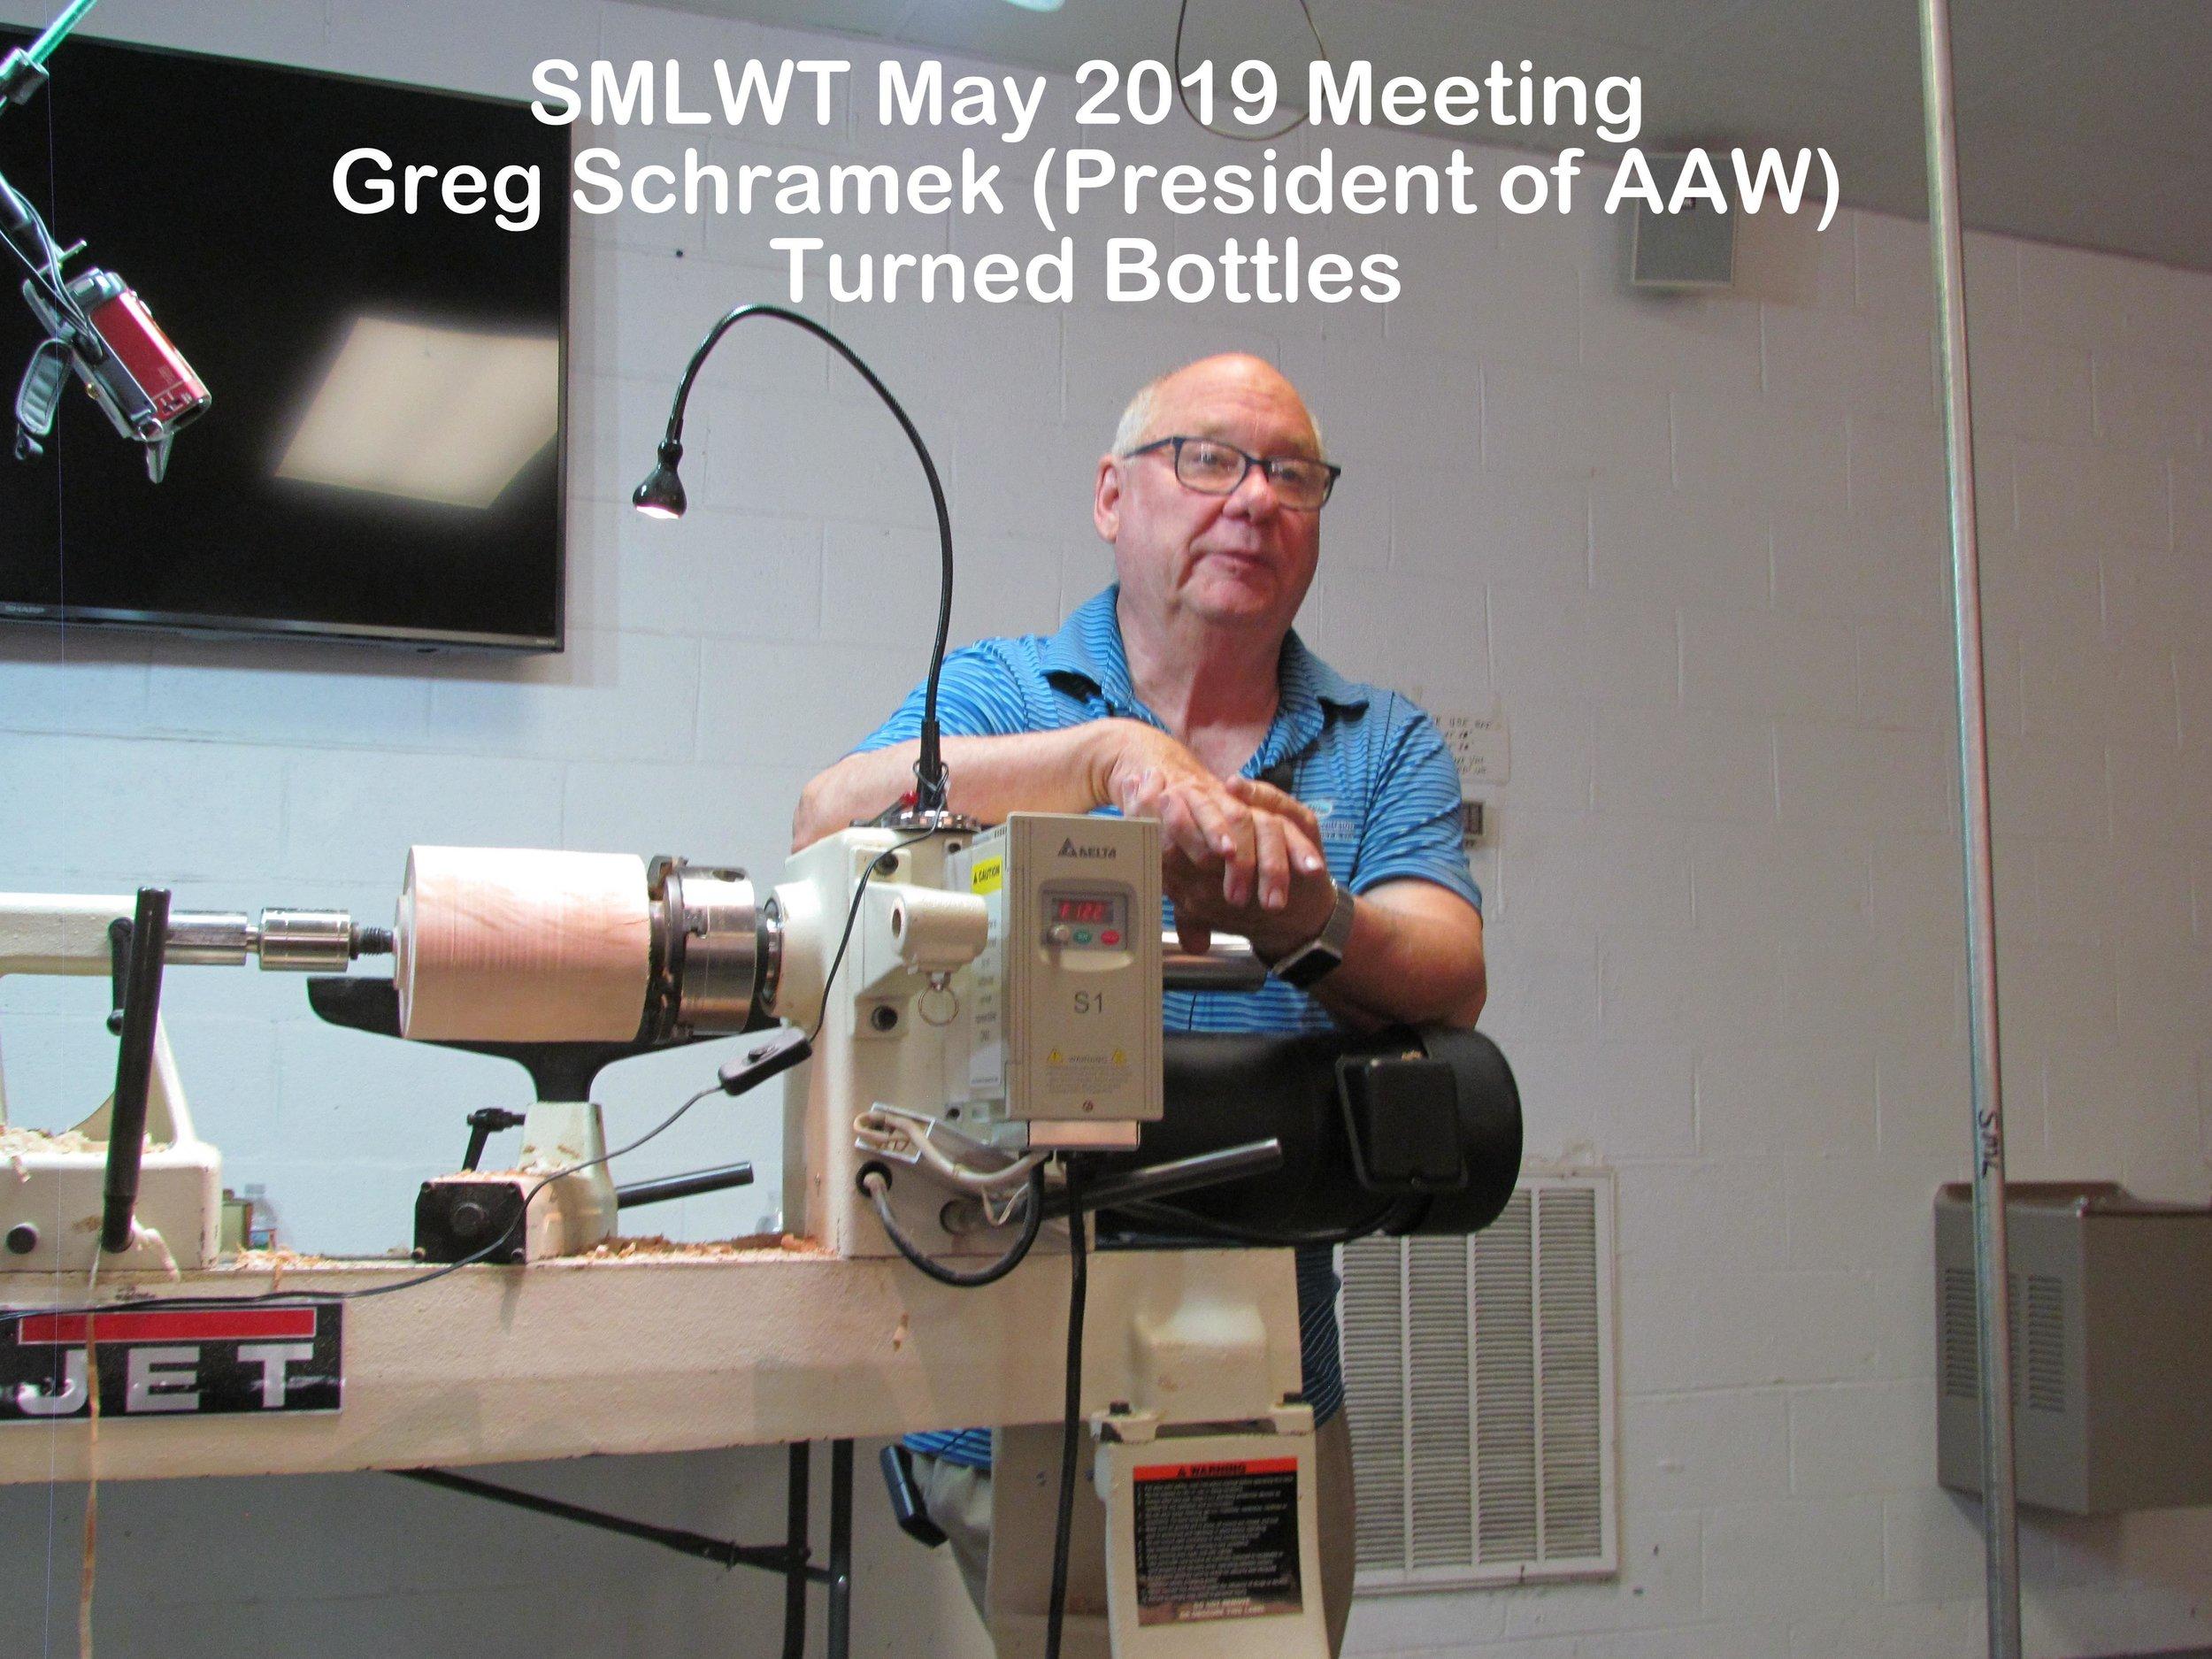 01-SMLWT May 2019 .JPG